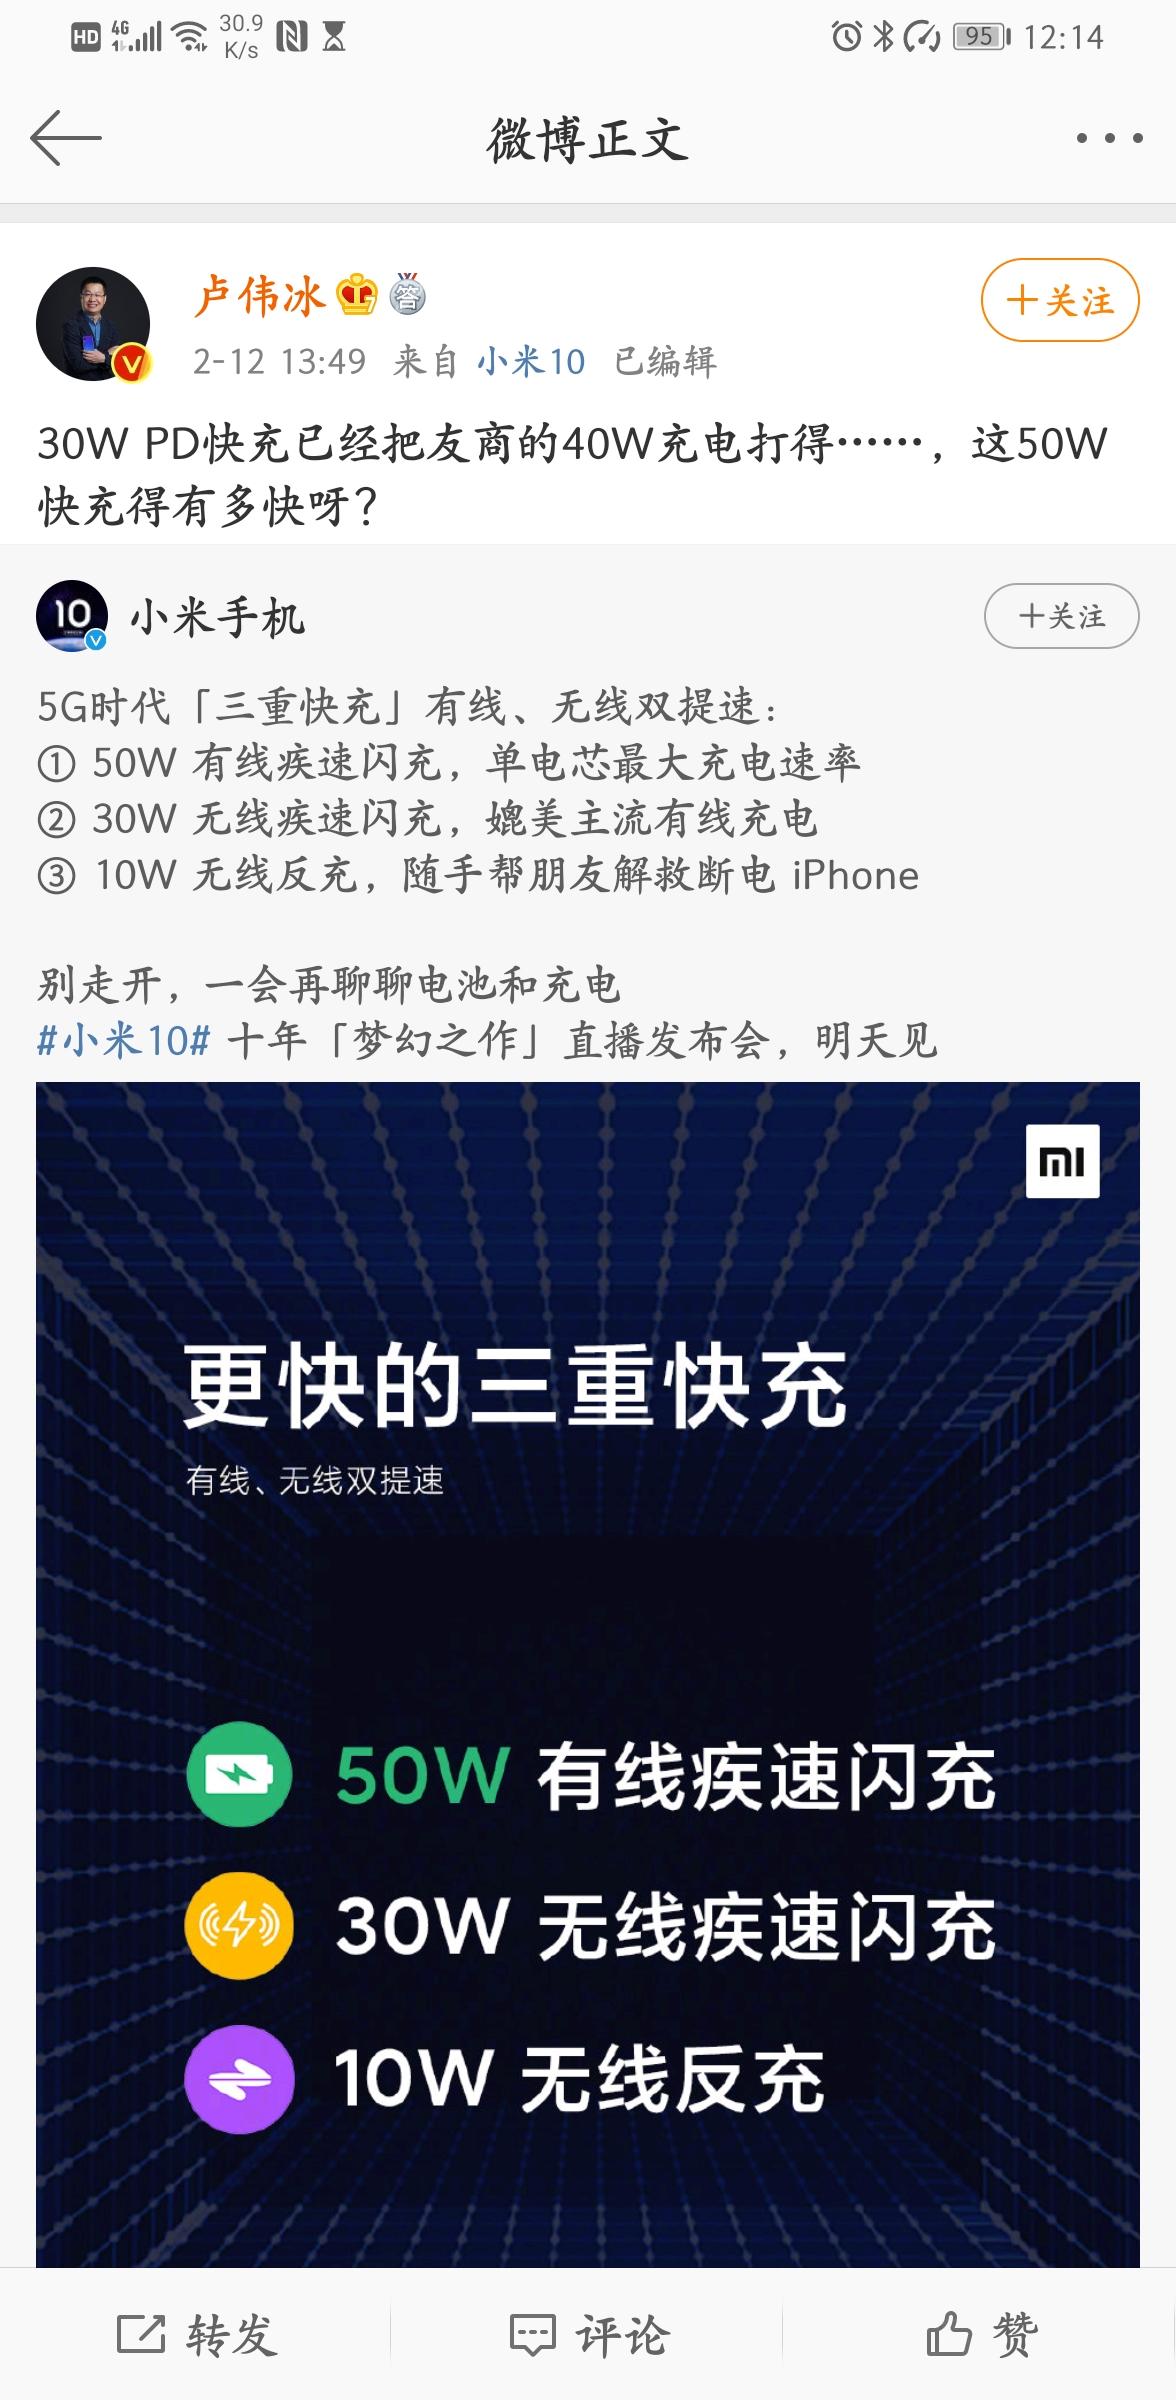 Screenshot_20200213_121442_com.sina.weibo.jpg